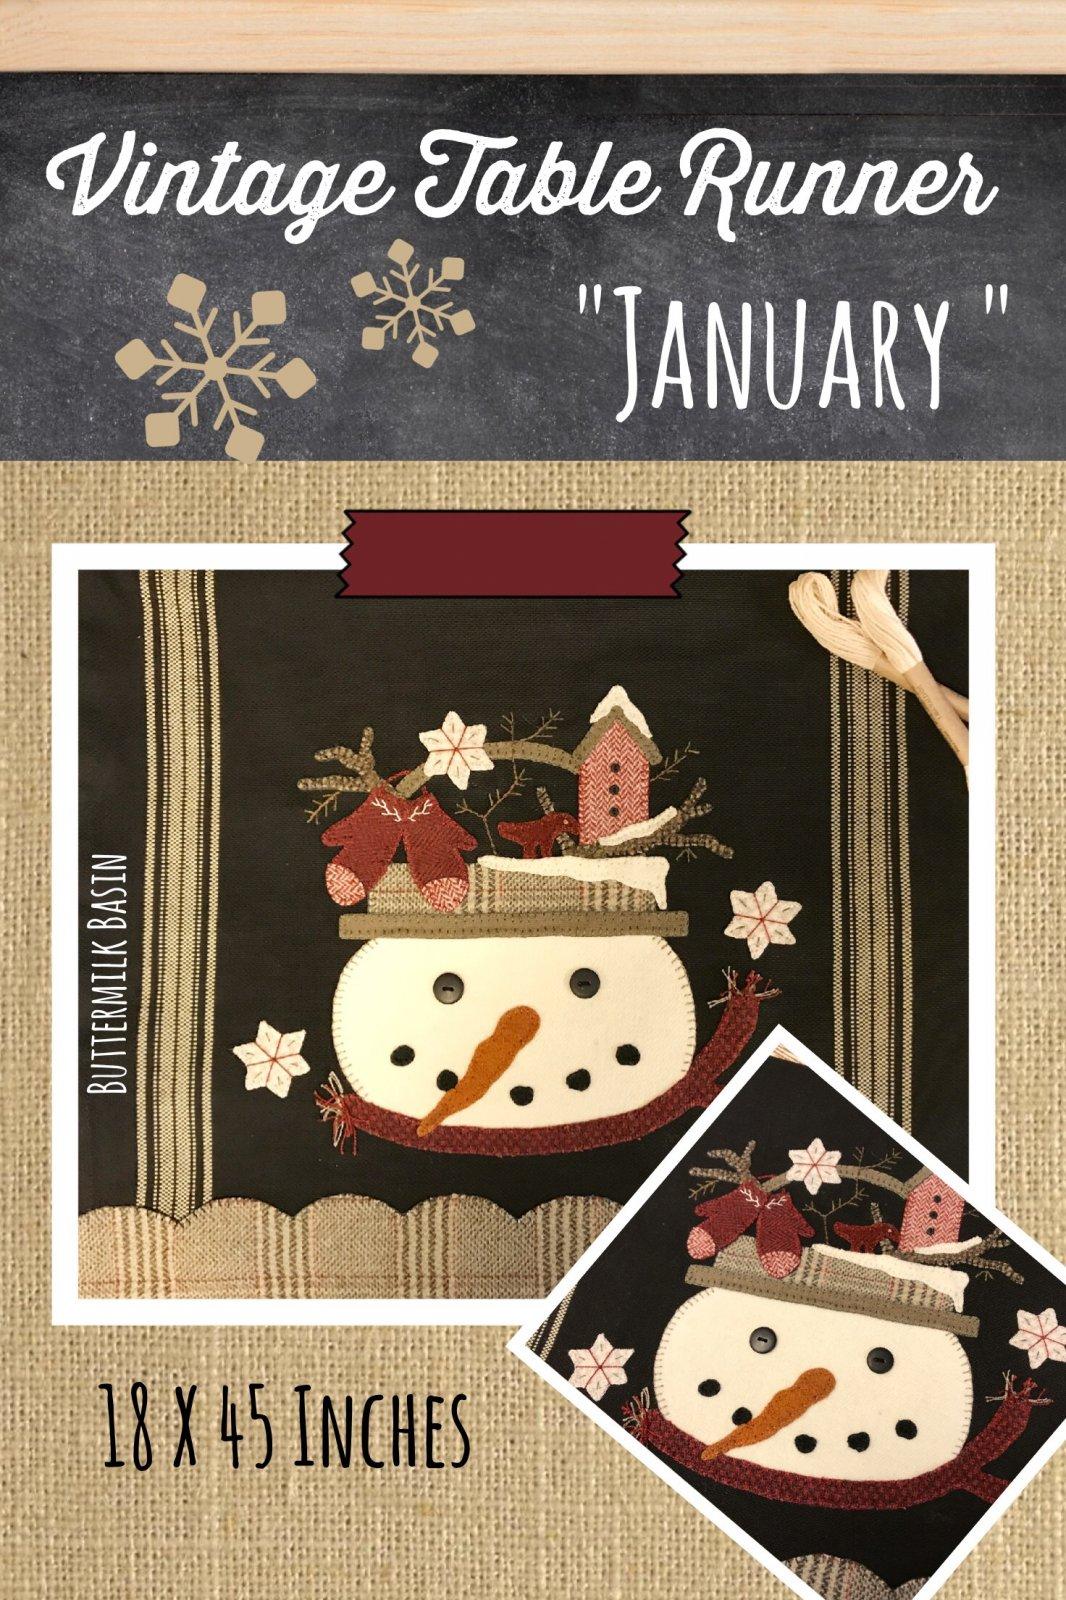 Vintage Table Runner thru the Year January KIT {Both Sides} & Pattern